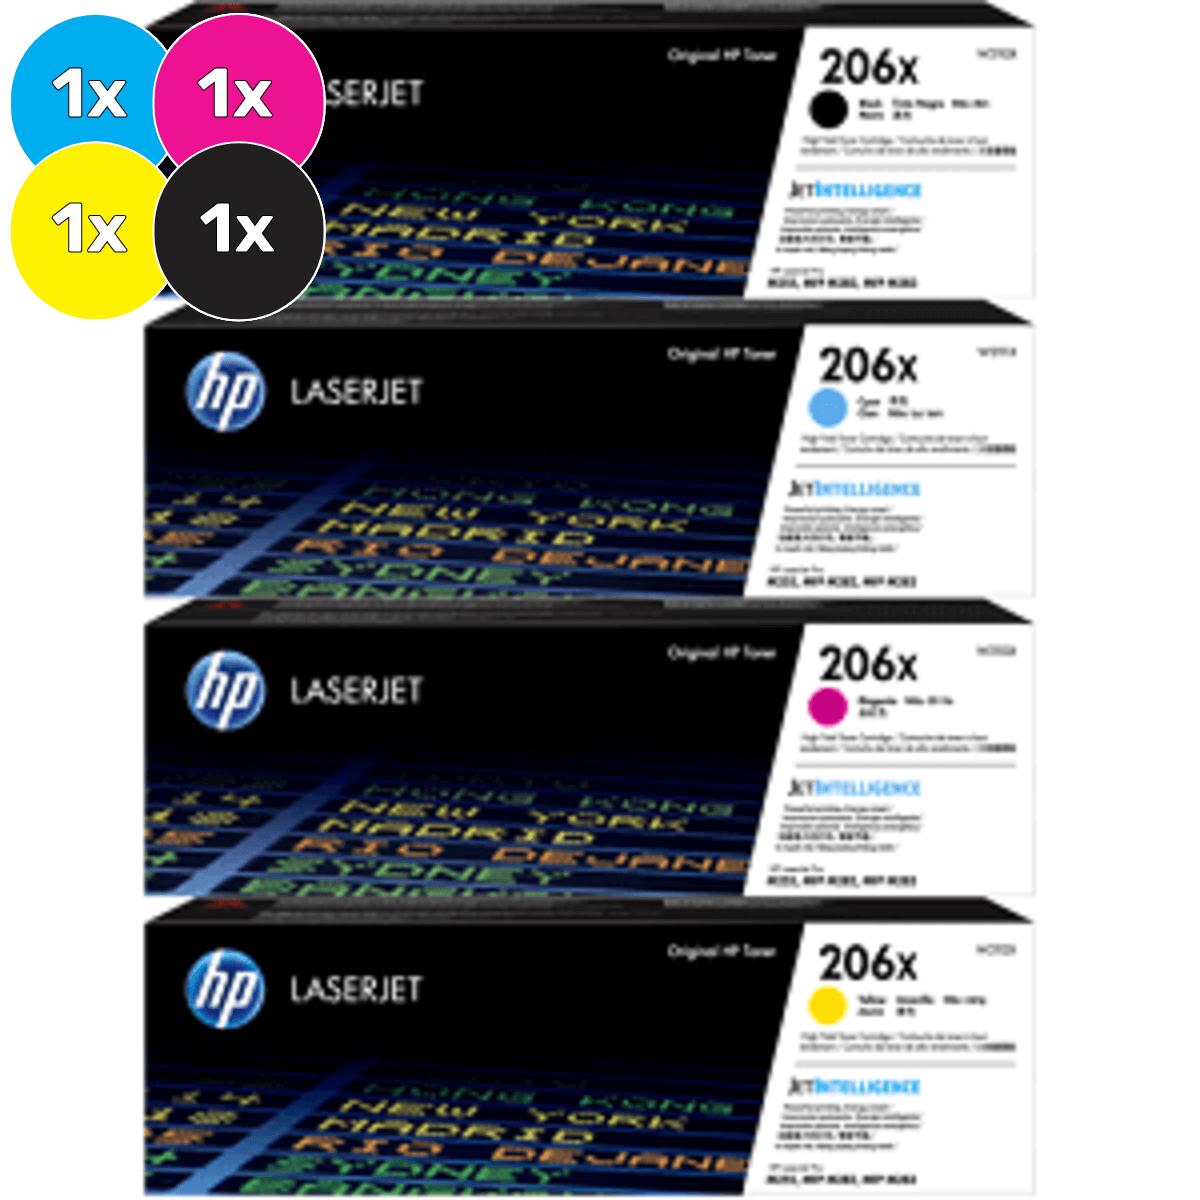 HP 206X Toner Cartridges Value Pack - Includes: [1 x Black, Cyan, Magenta, Yellow]